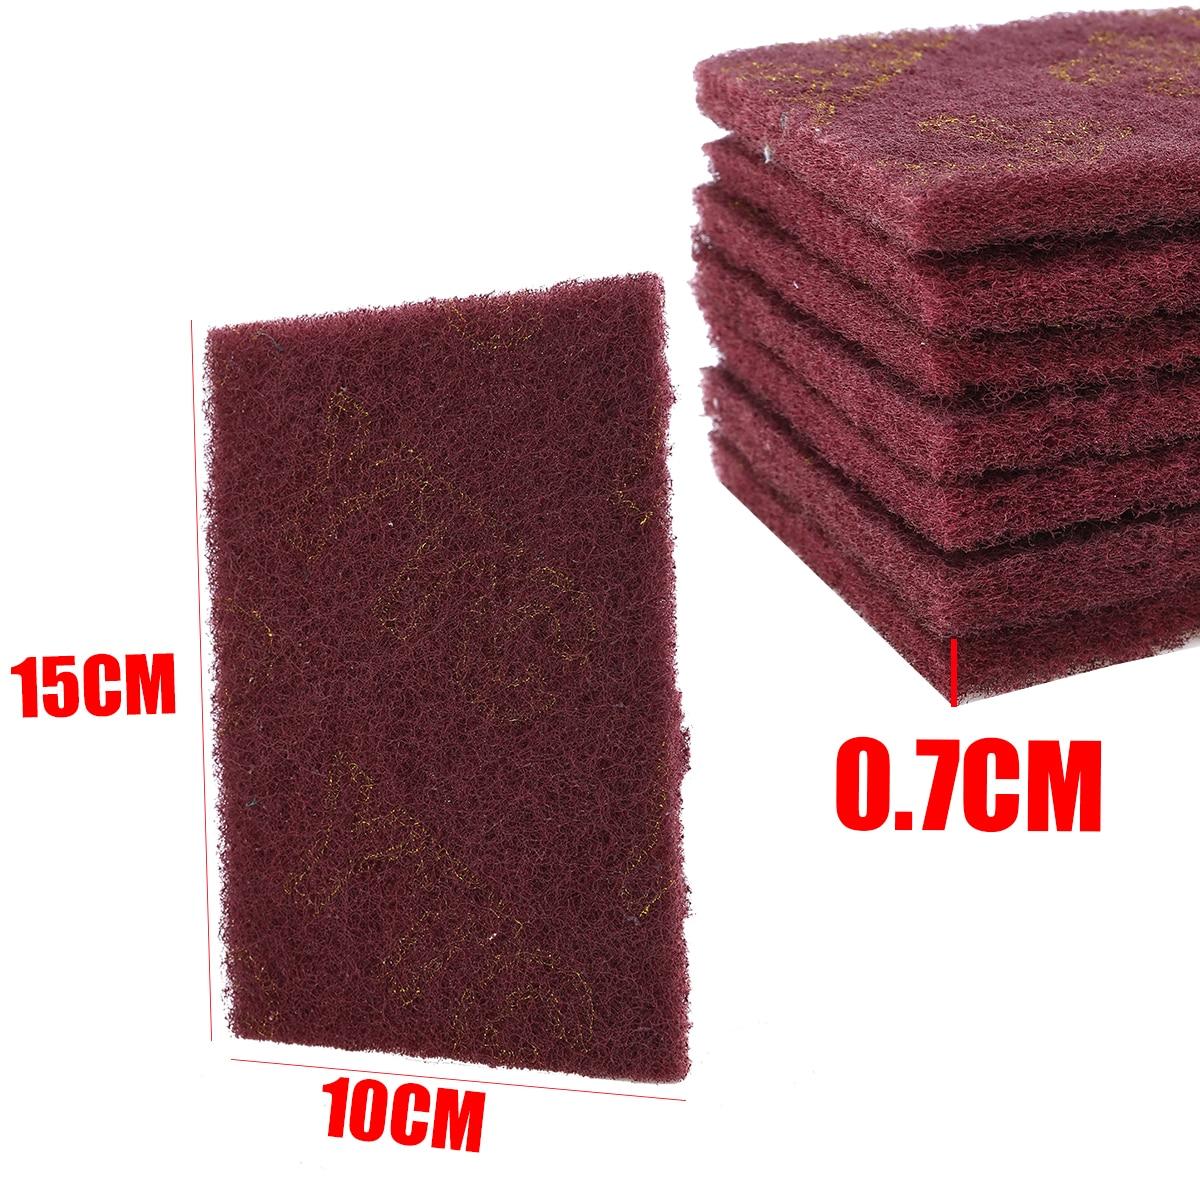 20pcs Scotch Brite Pad 15x10x0.7cm Gris//Rojo Acabado Abrasivo Fino Scotch Brite Almohadillas para Limpieza Pulido